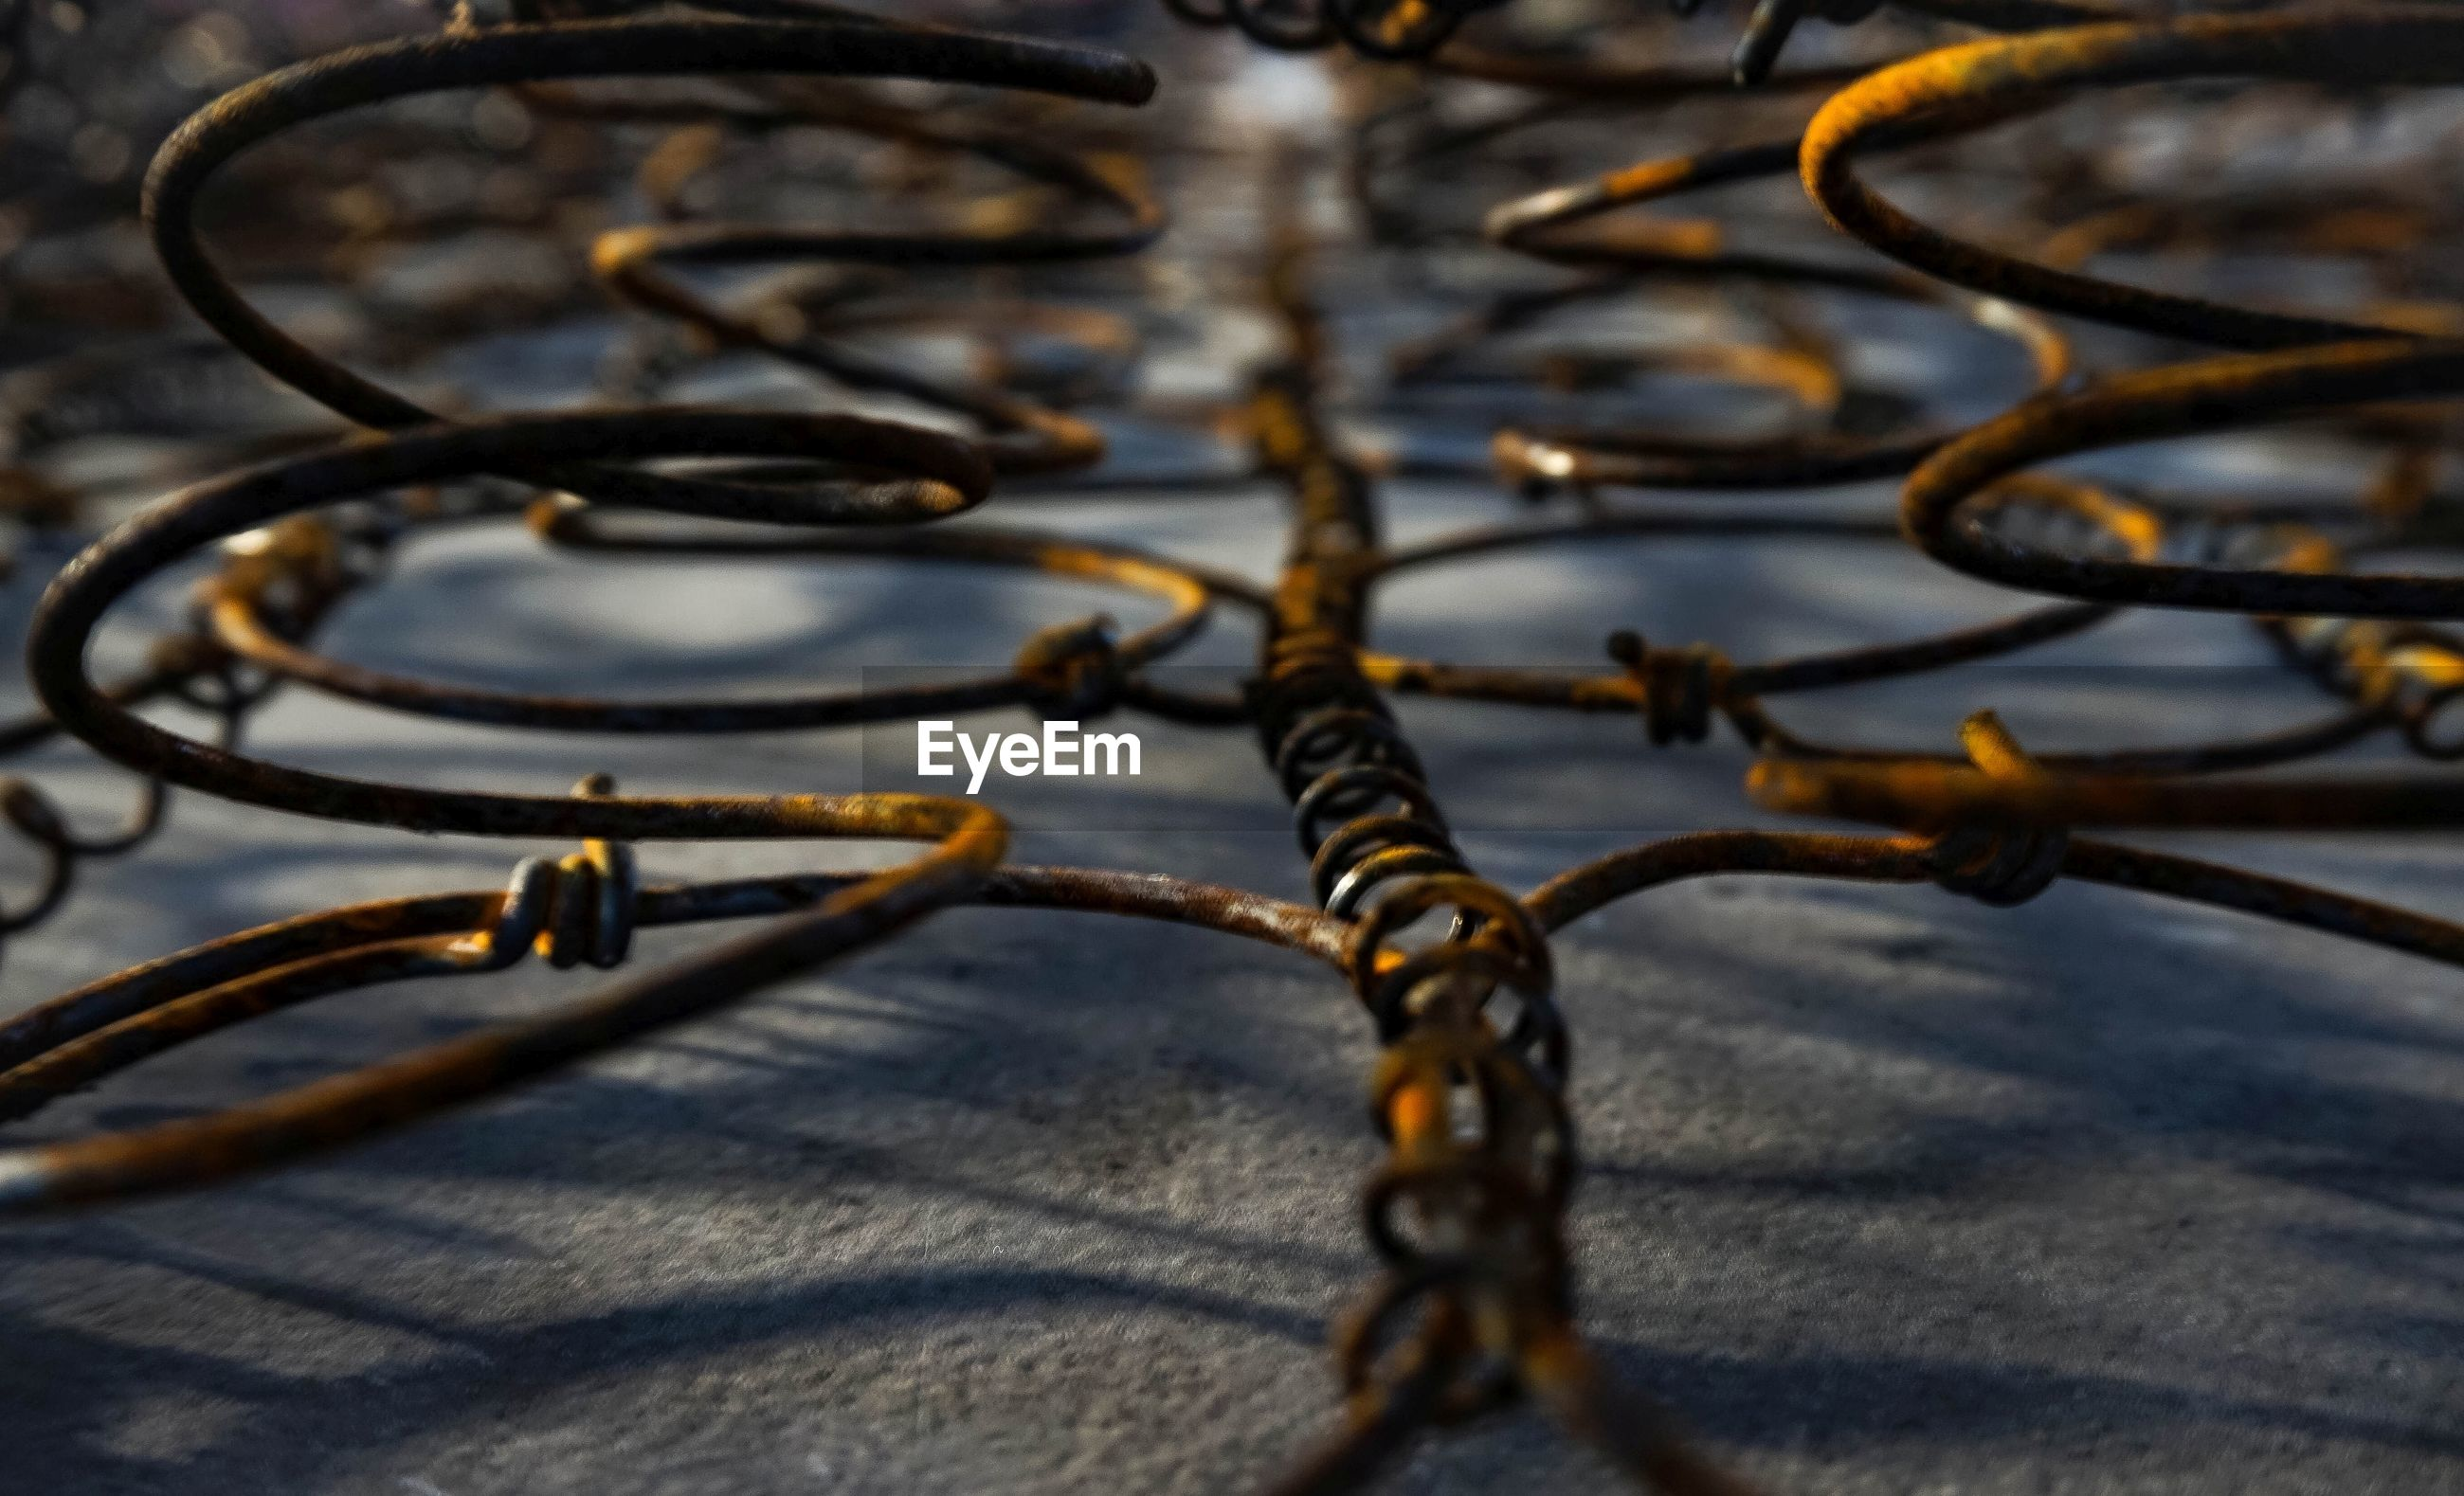 Full frame shot of rusty metal spring